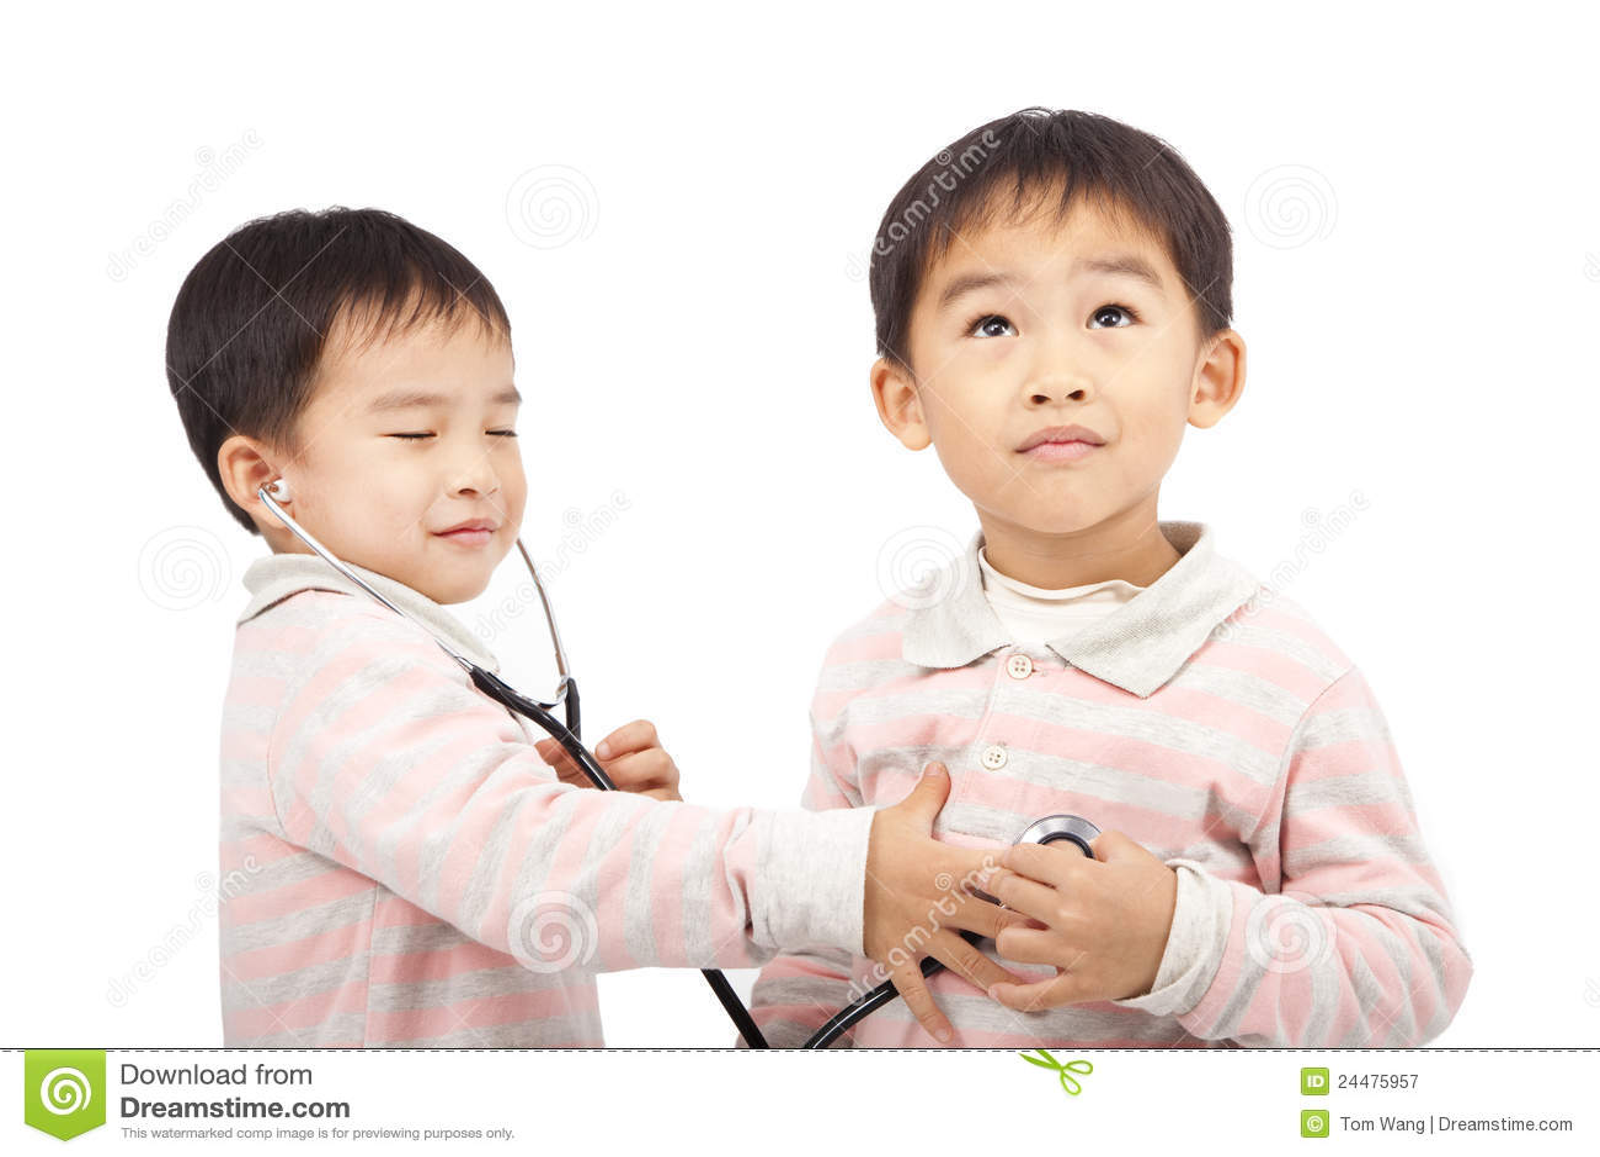 Ttwo boys using stethoscope Check